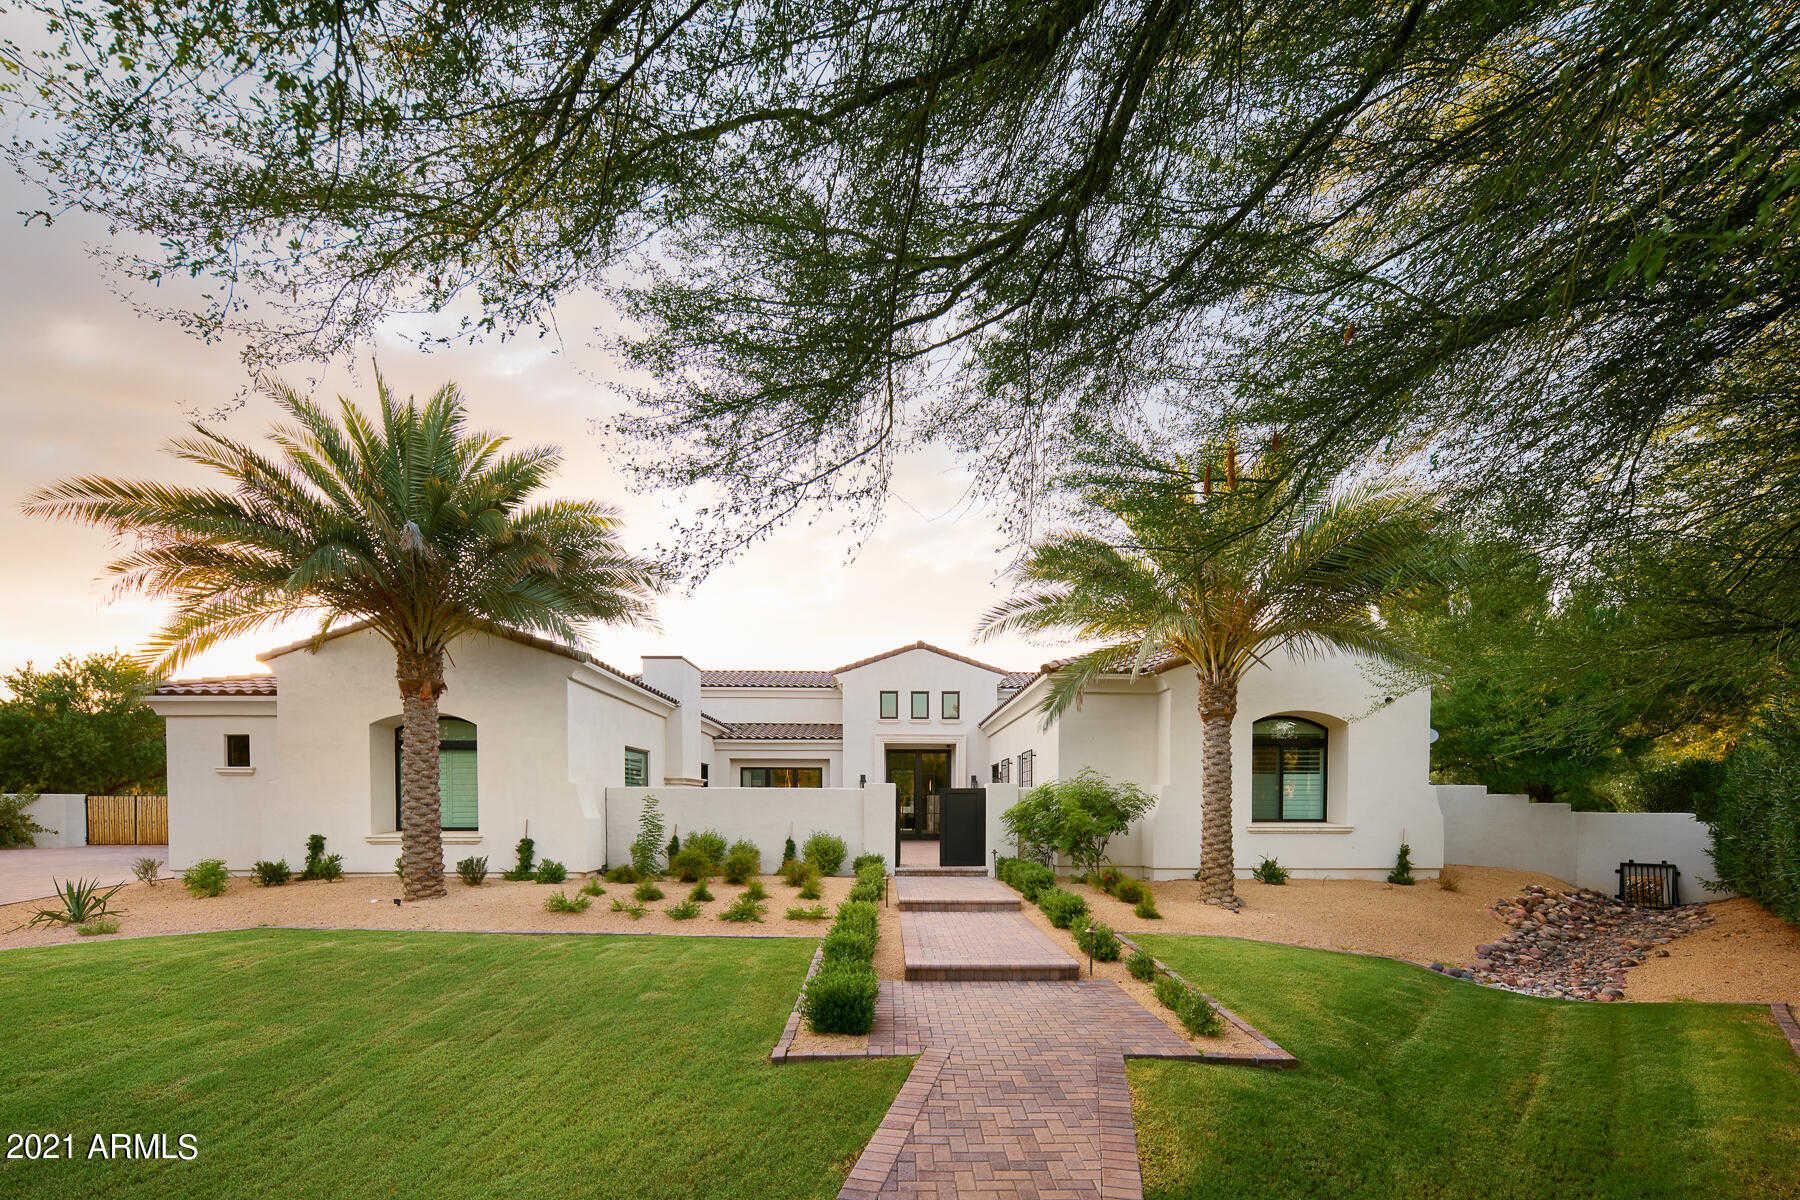 $6,471,522 - 5Br/6Ba - Home for Sale in Mockingbird Lane Estates 3, Paradise Valley